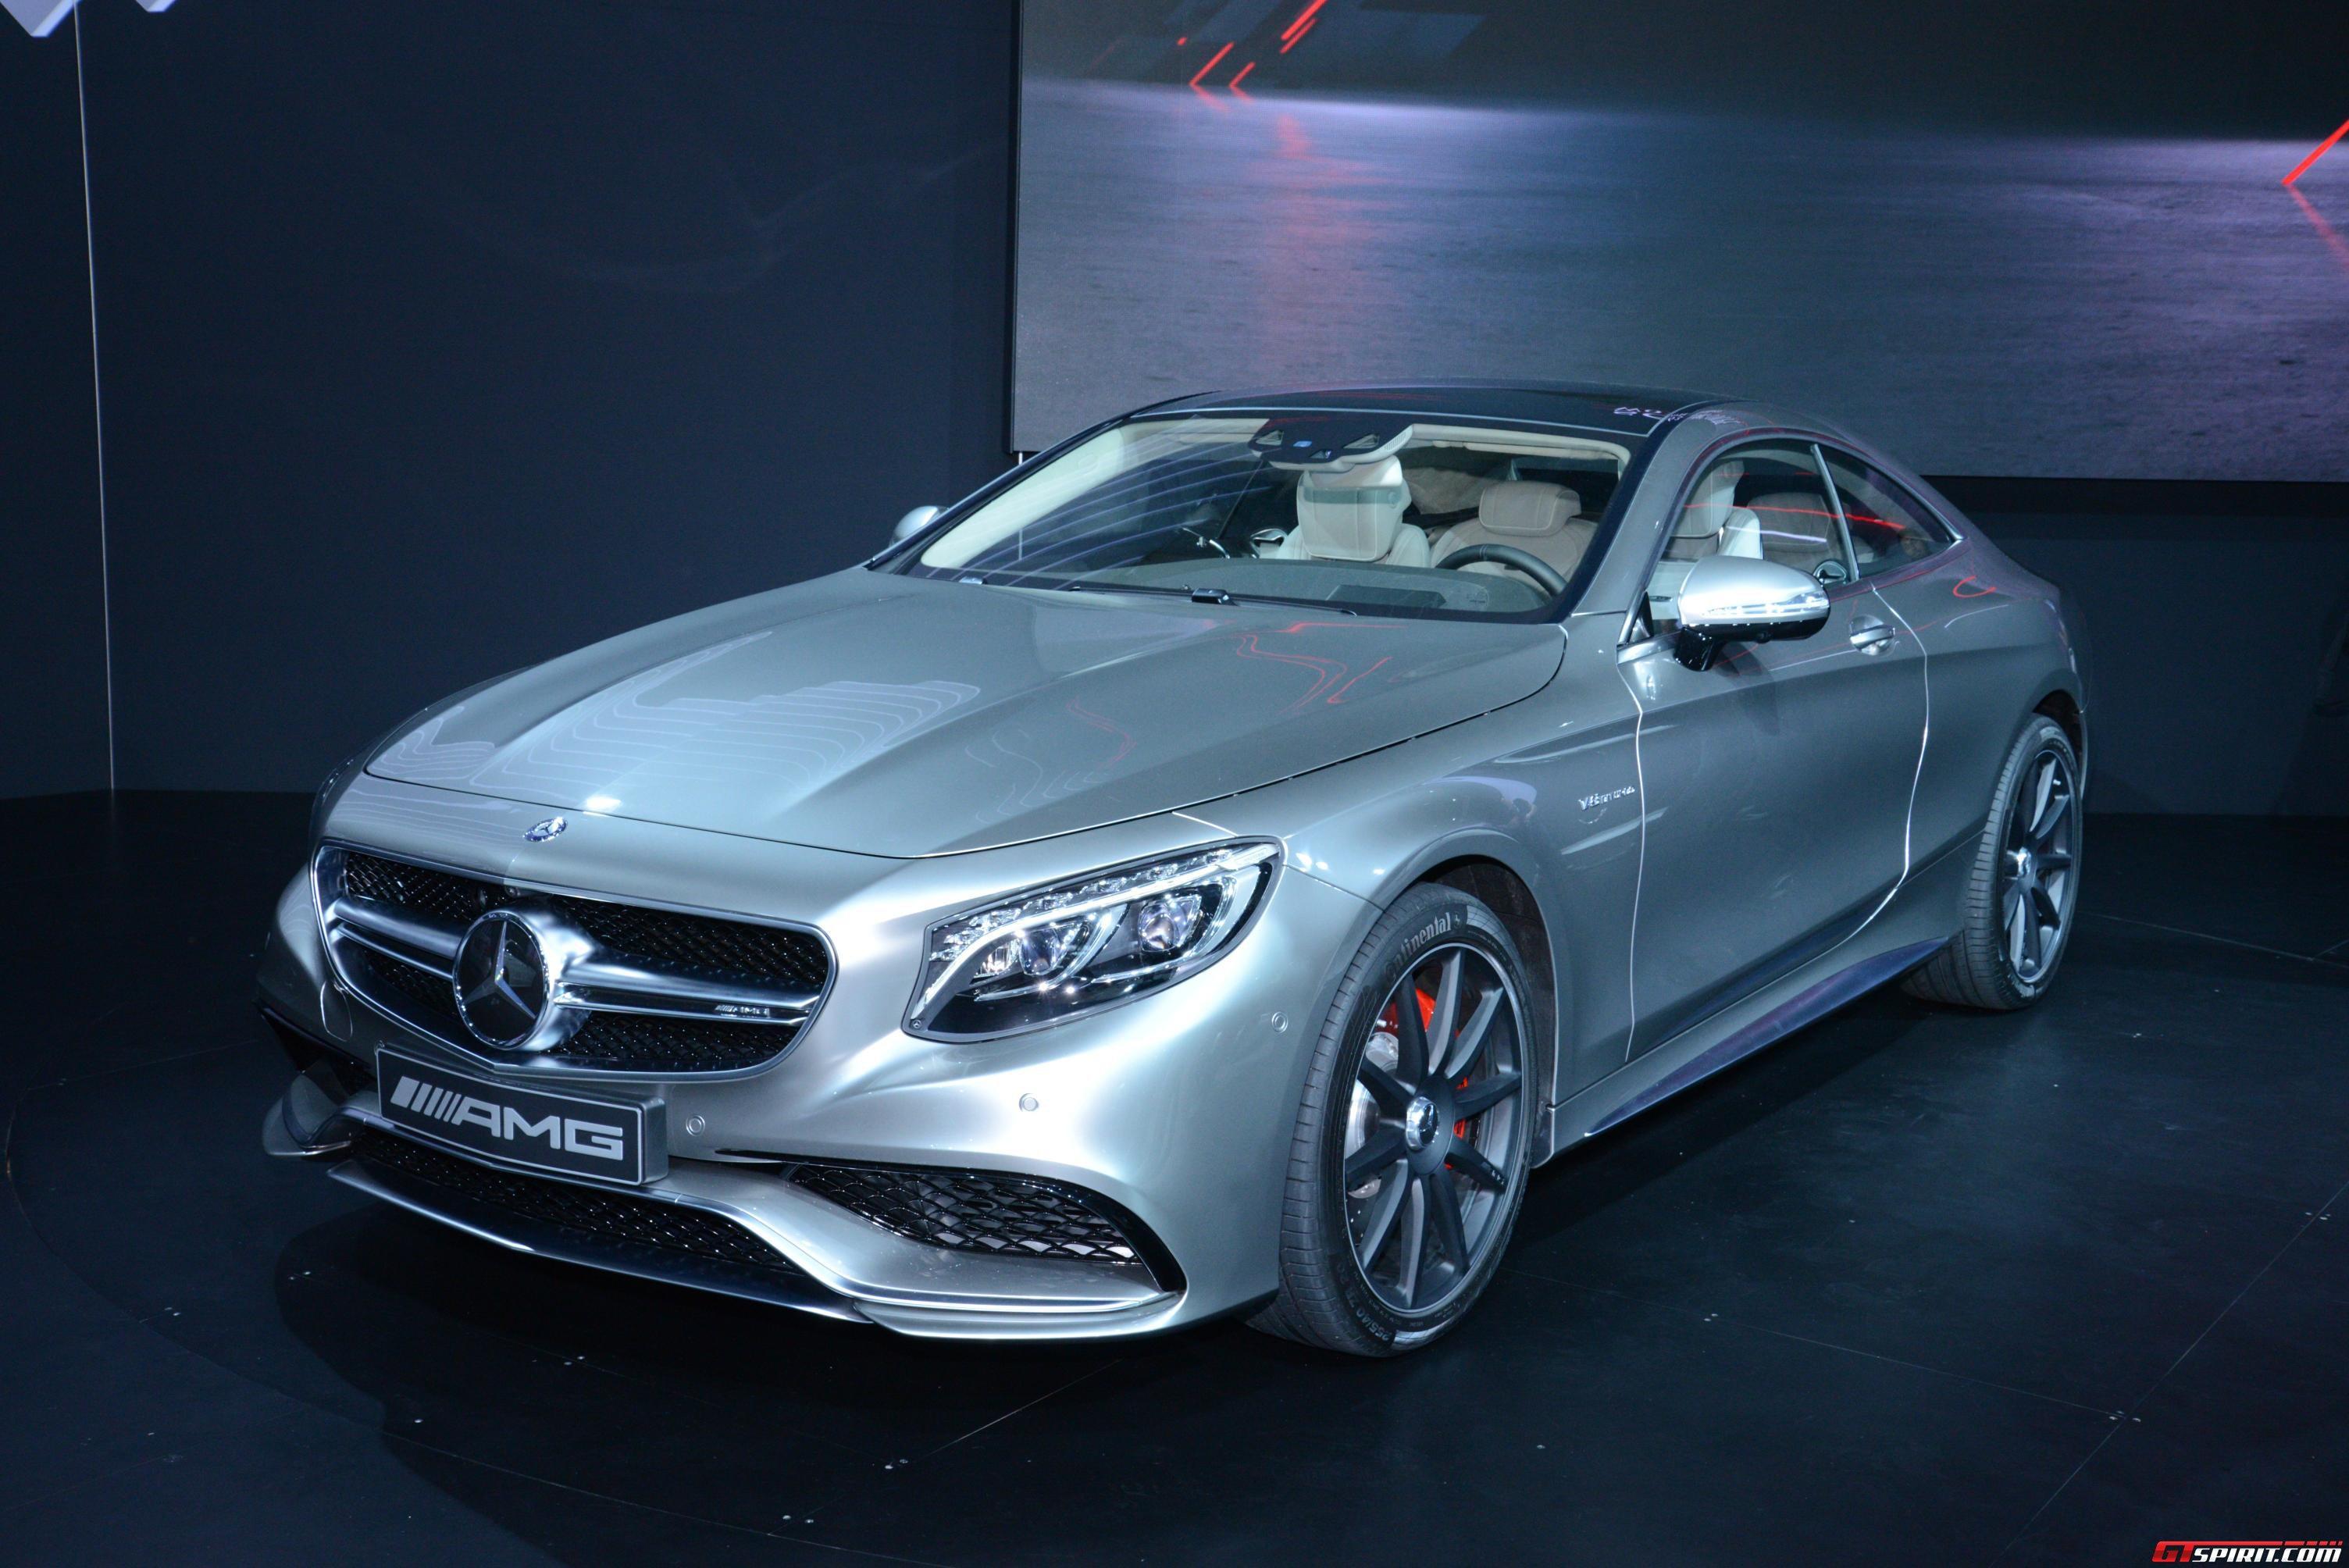 New York 2014: Mercedes-Benz S 63 AMG 4MATIC Coupe - GTspirit